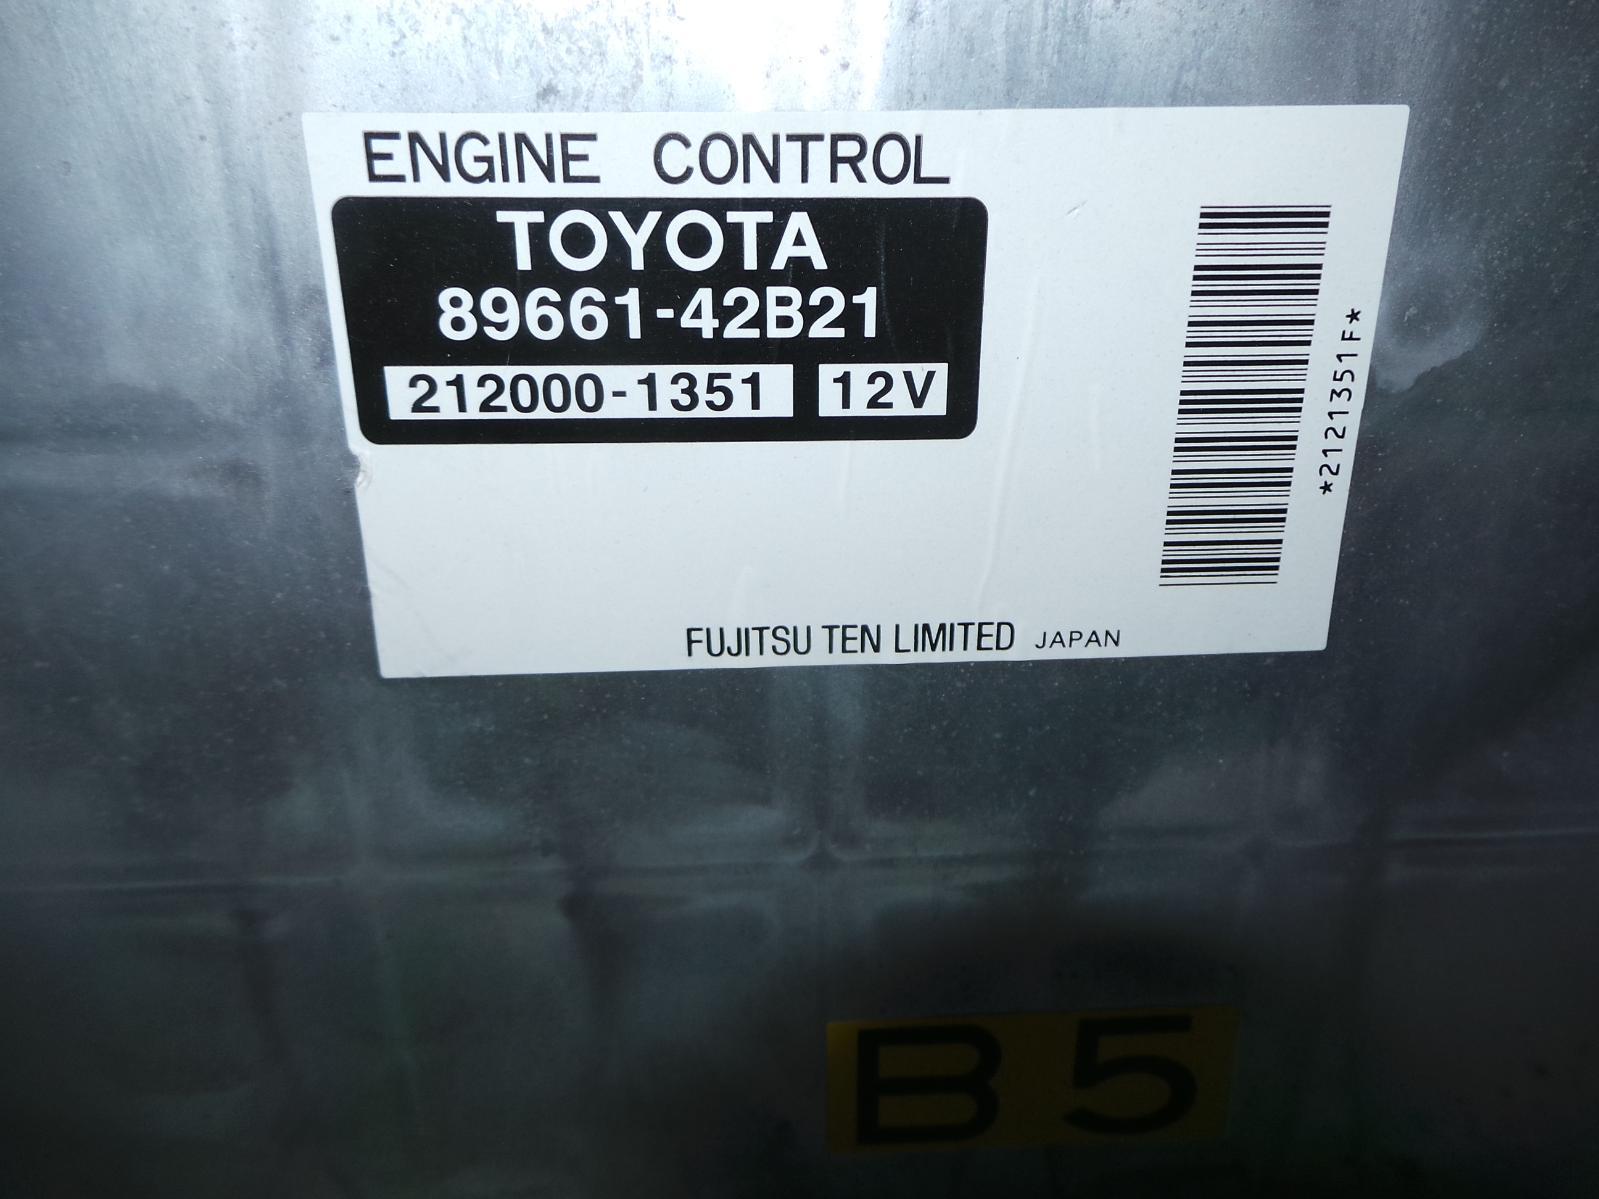 TOYOTA RAV4, Ecu, ENGINE ECU, 2.4, AUTO T/M TYPE, 89661-42B21, ECU ONLY, ACA2#R, 07/03-10/05